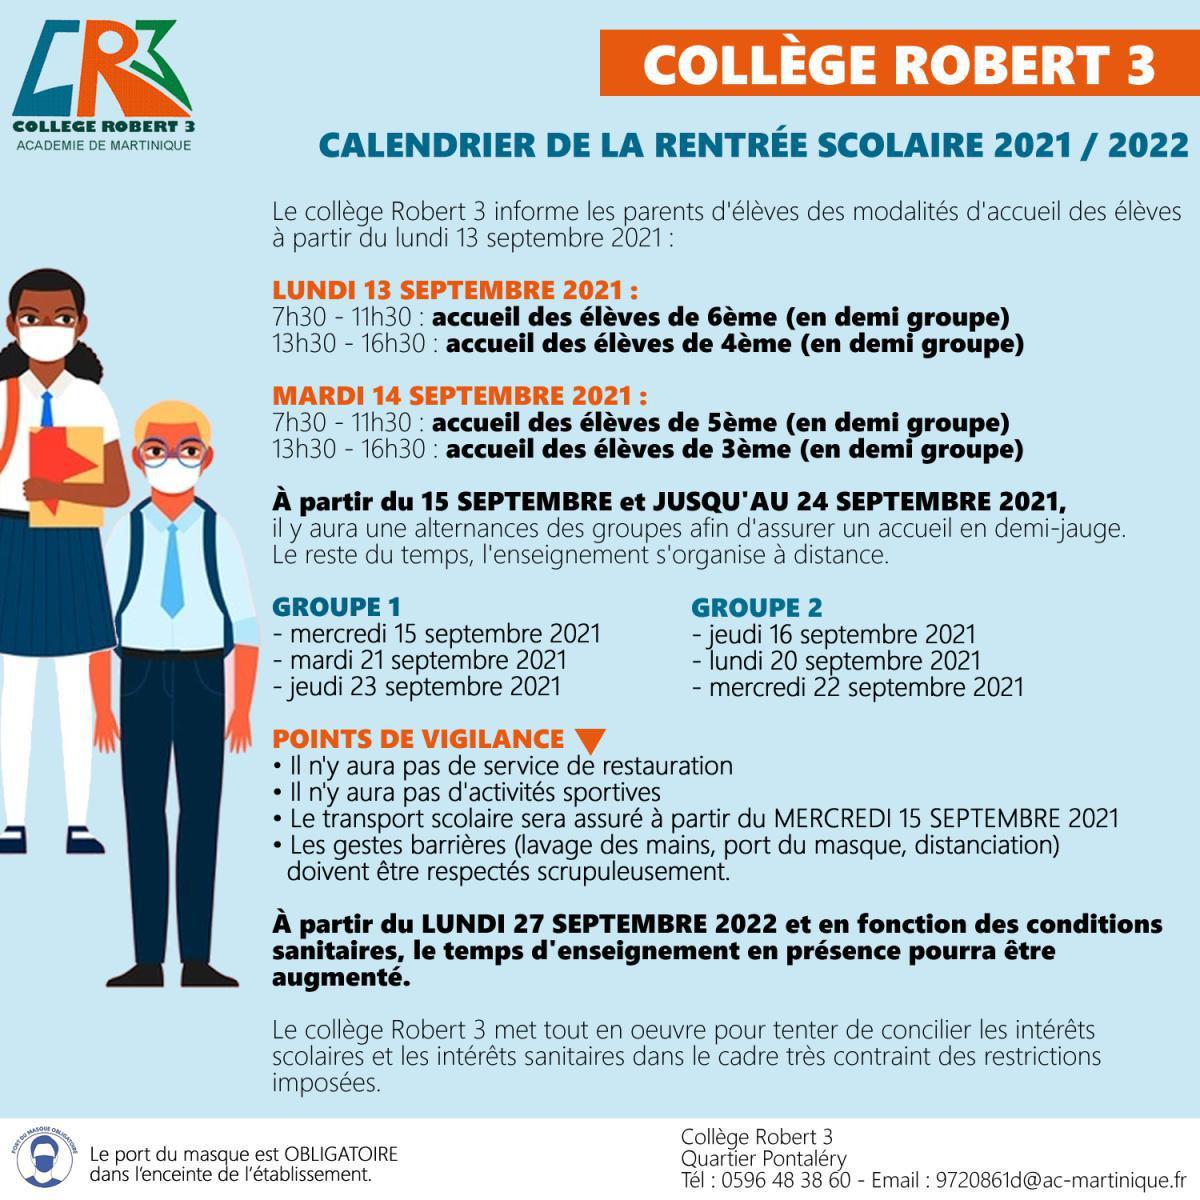 CALENDRIER DE LA RENTREE SCOLAIRE 2021 / 2022